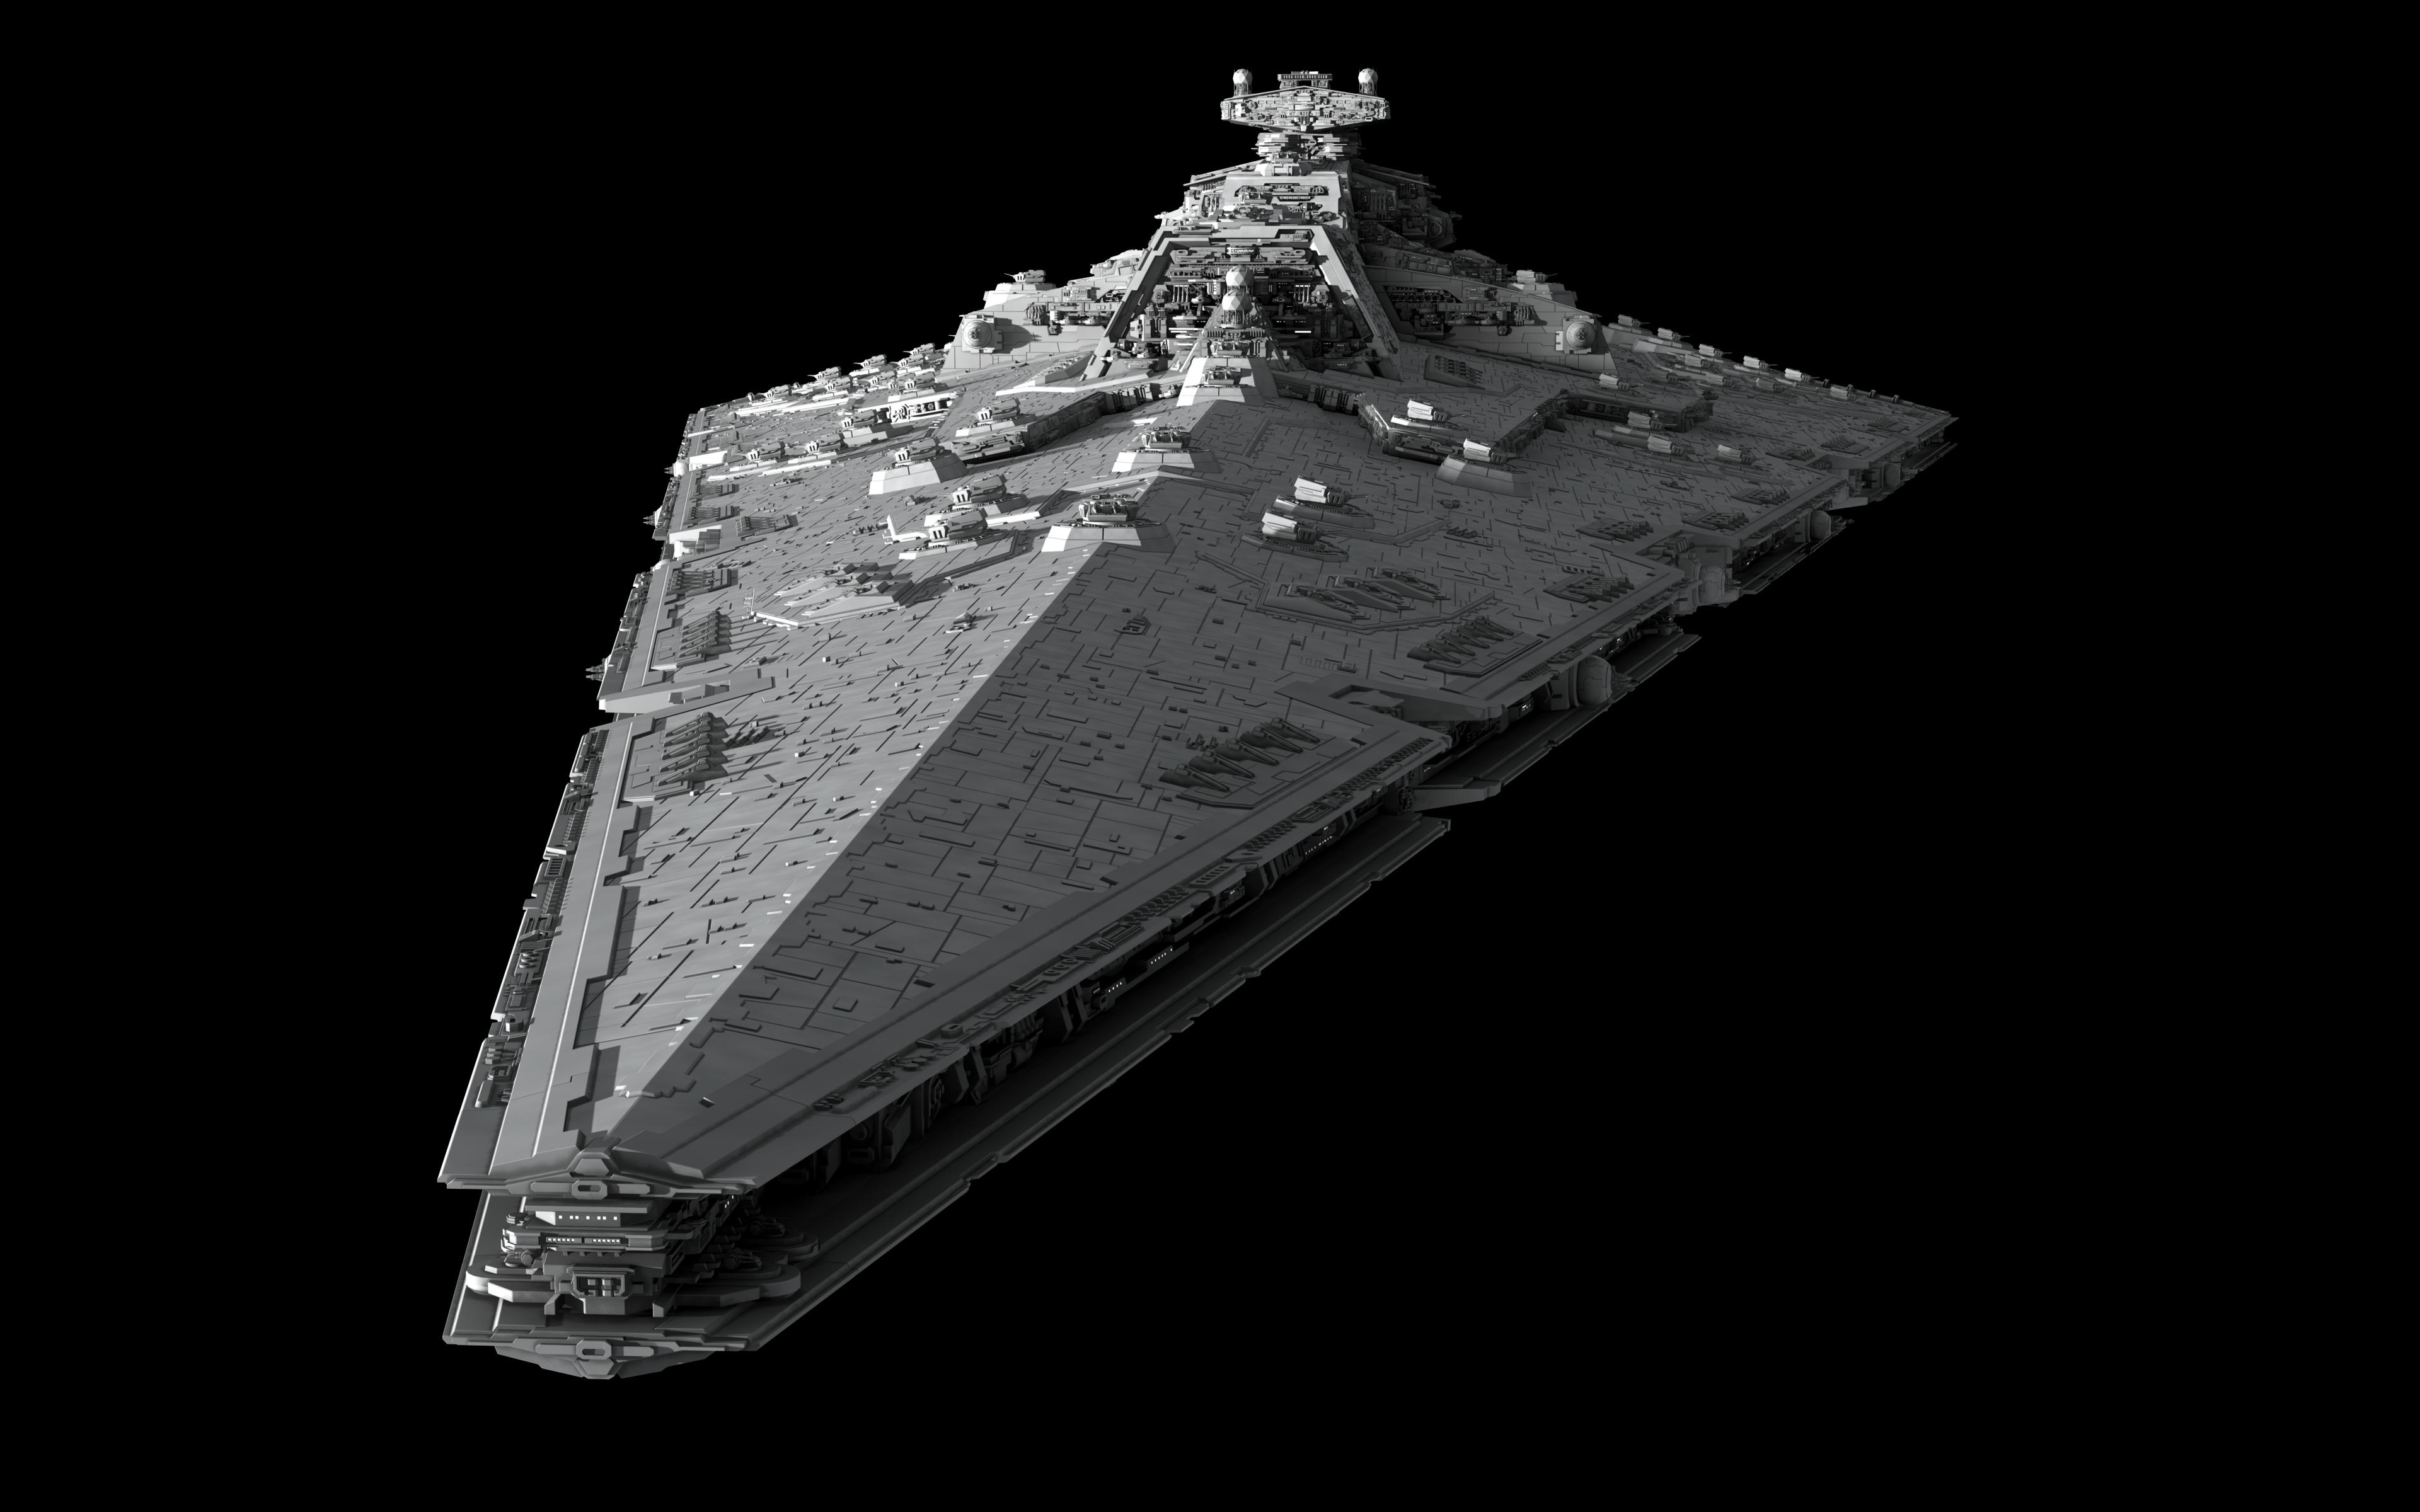 Star wars 4k ultra hd wallpaper background image - 4k star wars wallpaper ...